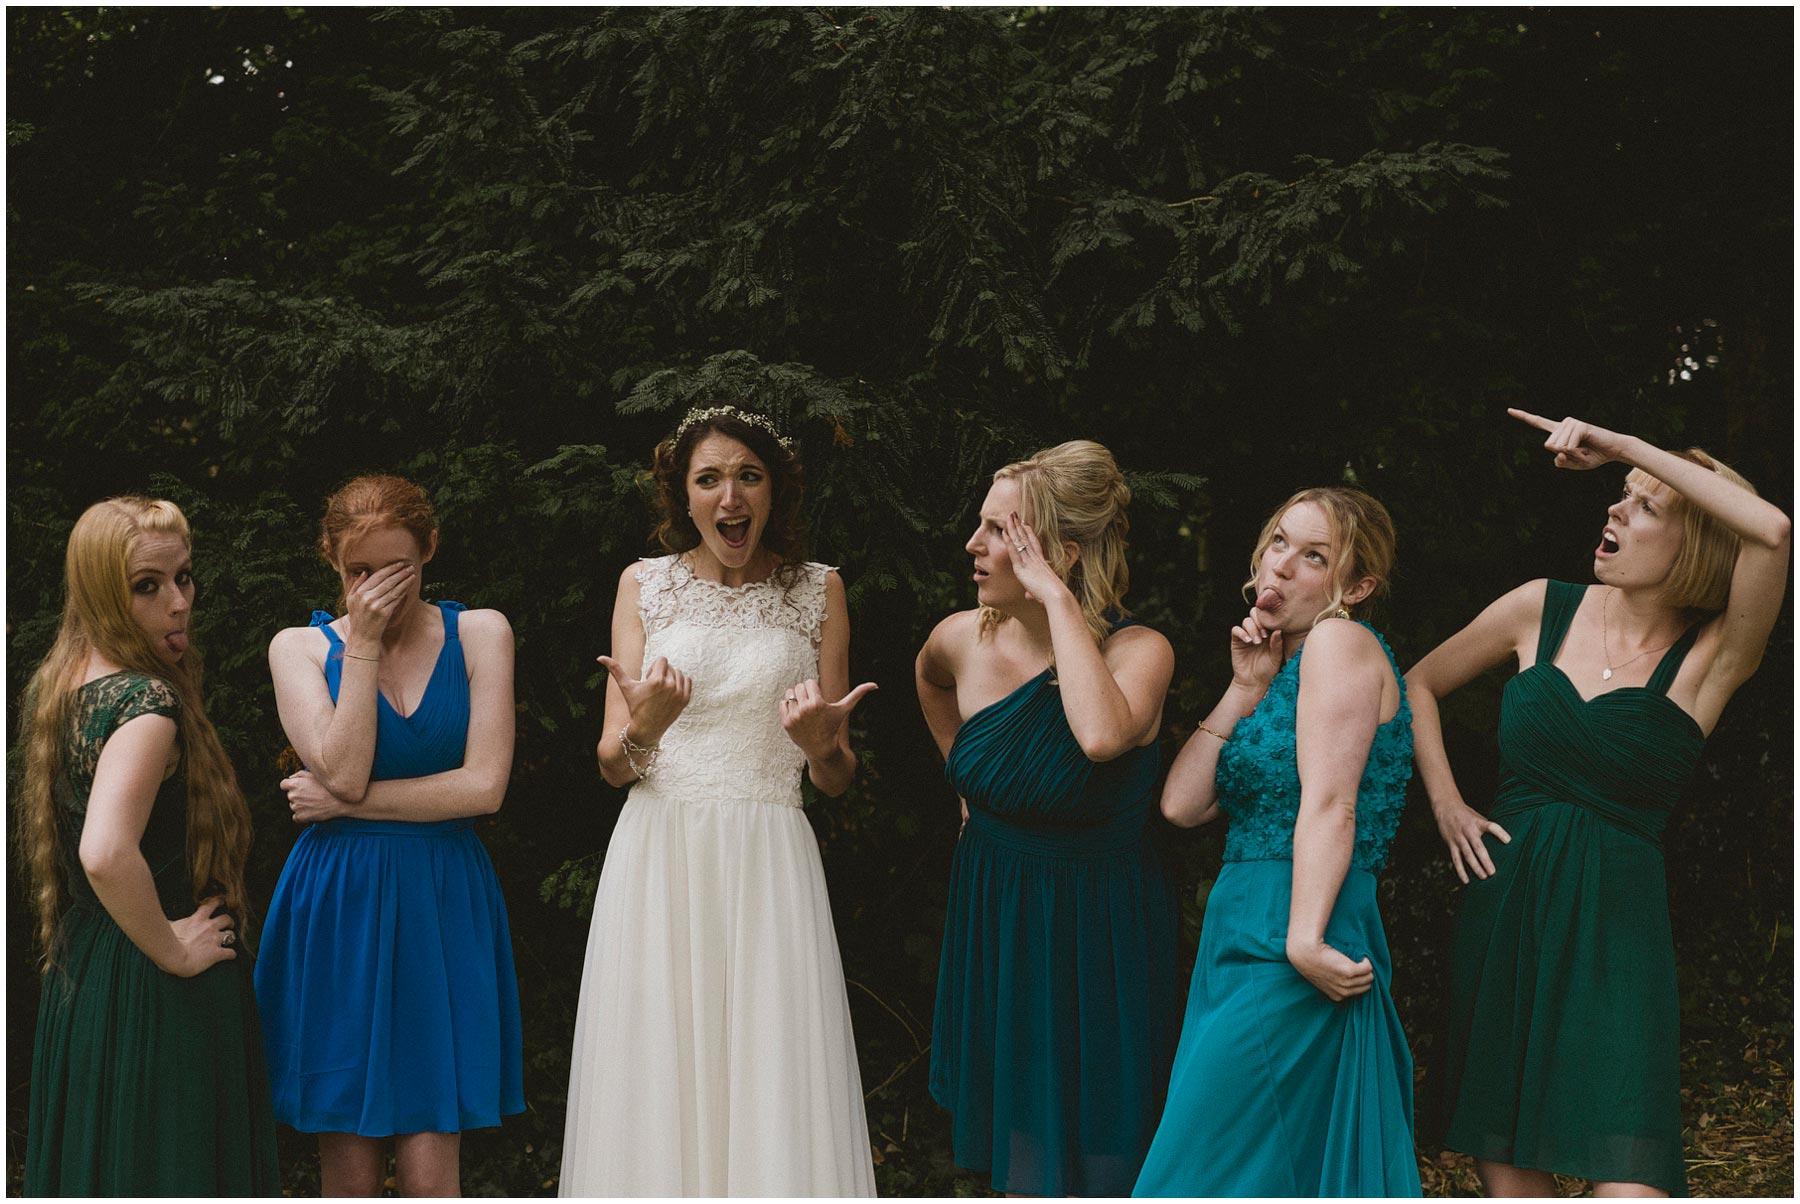 Colehayes-Park-Wedding-Photography_0152